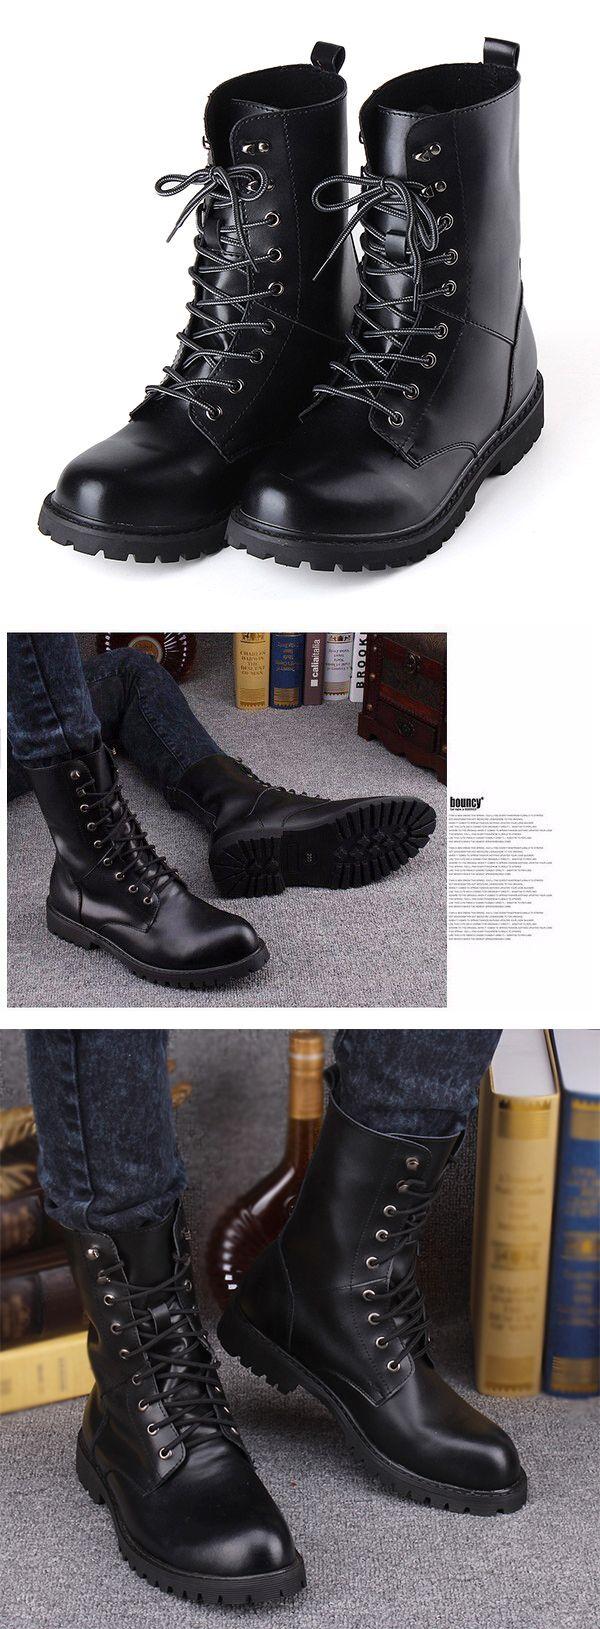 Mid Calf Work Boots   Mens boots